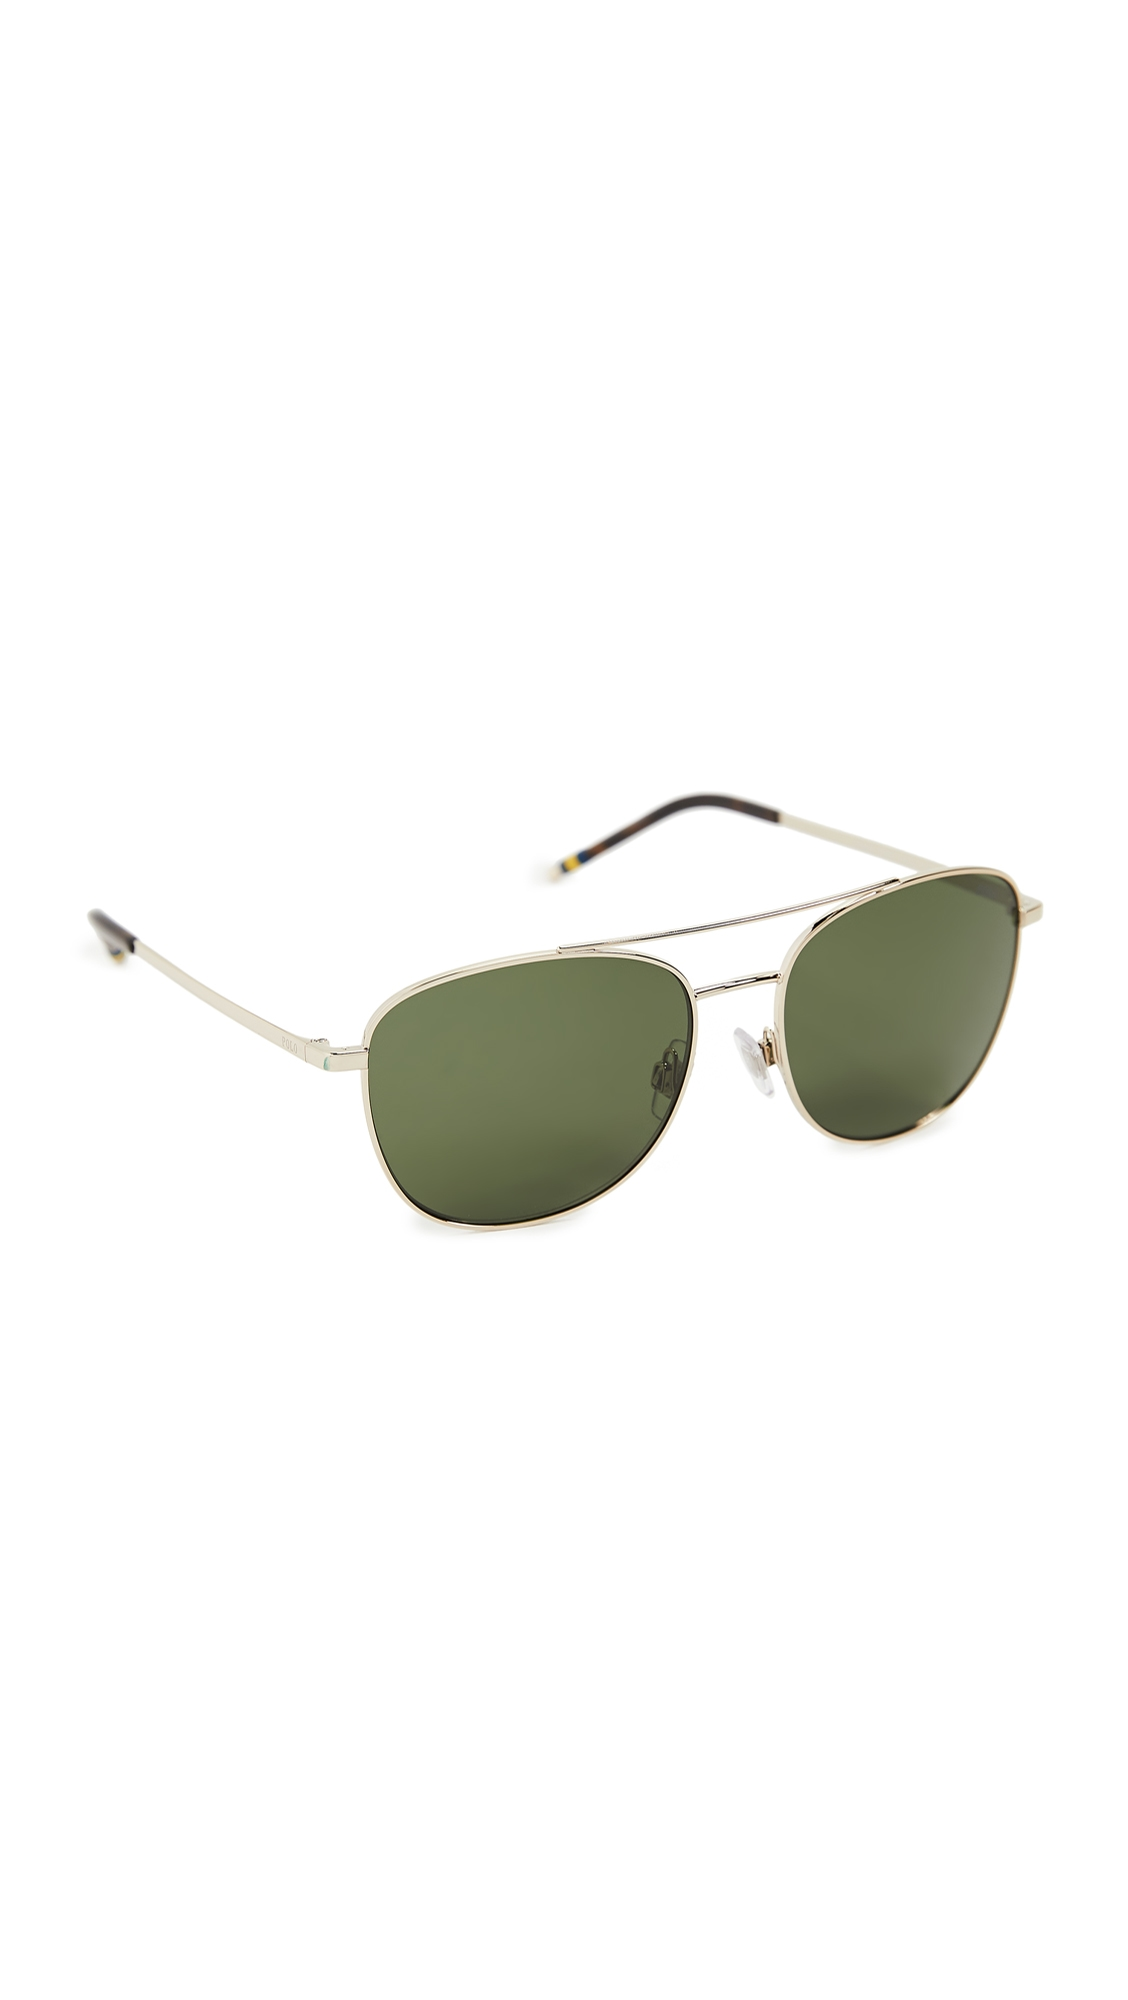 Polo Ralph Lauren 0ph3127-sunglasses In Shiny Pale Gold